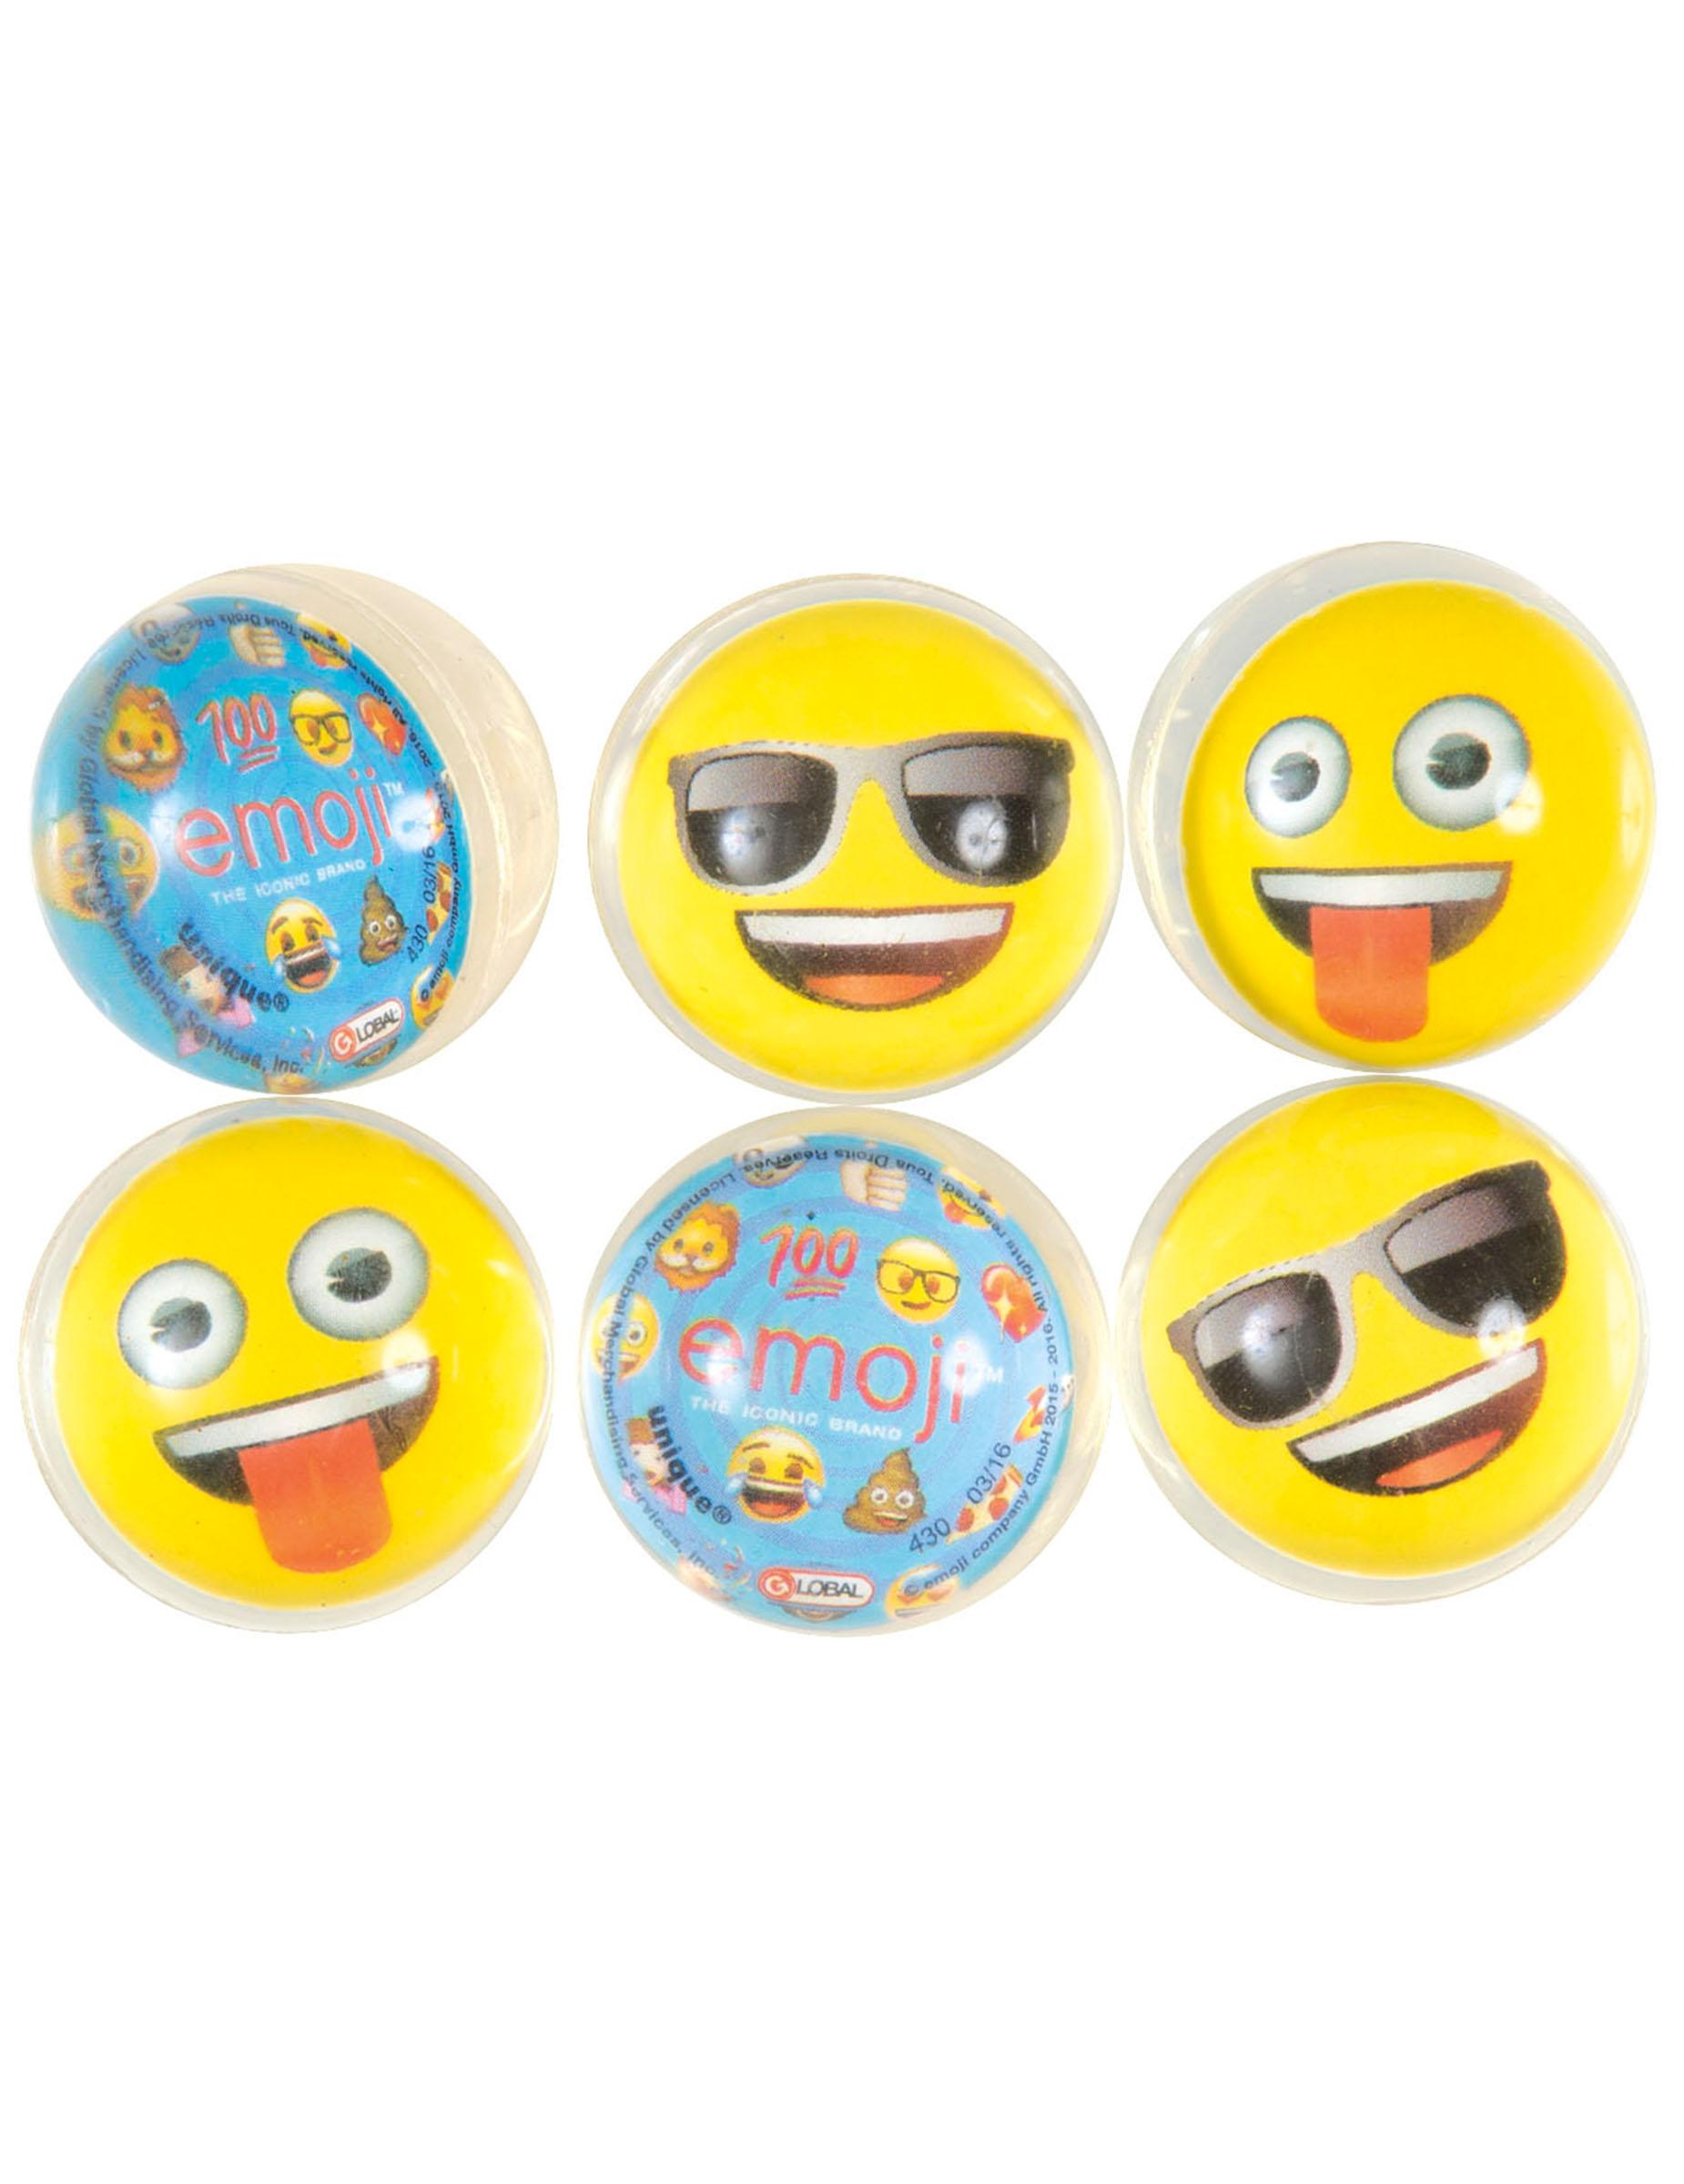 6 balles rebondissantes emoji deguise toi achat de for Decoration emoji